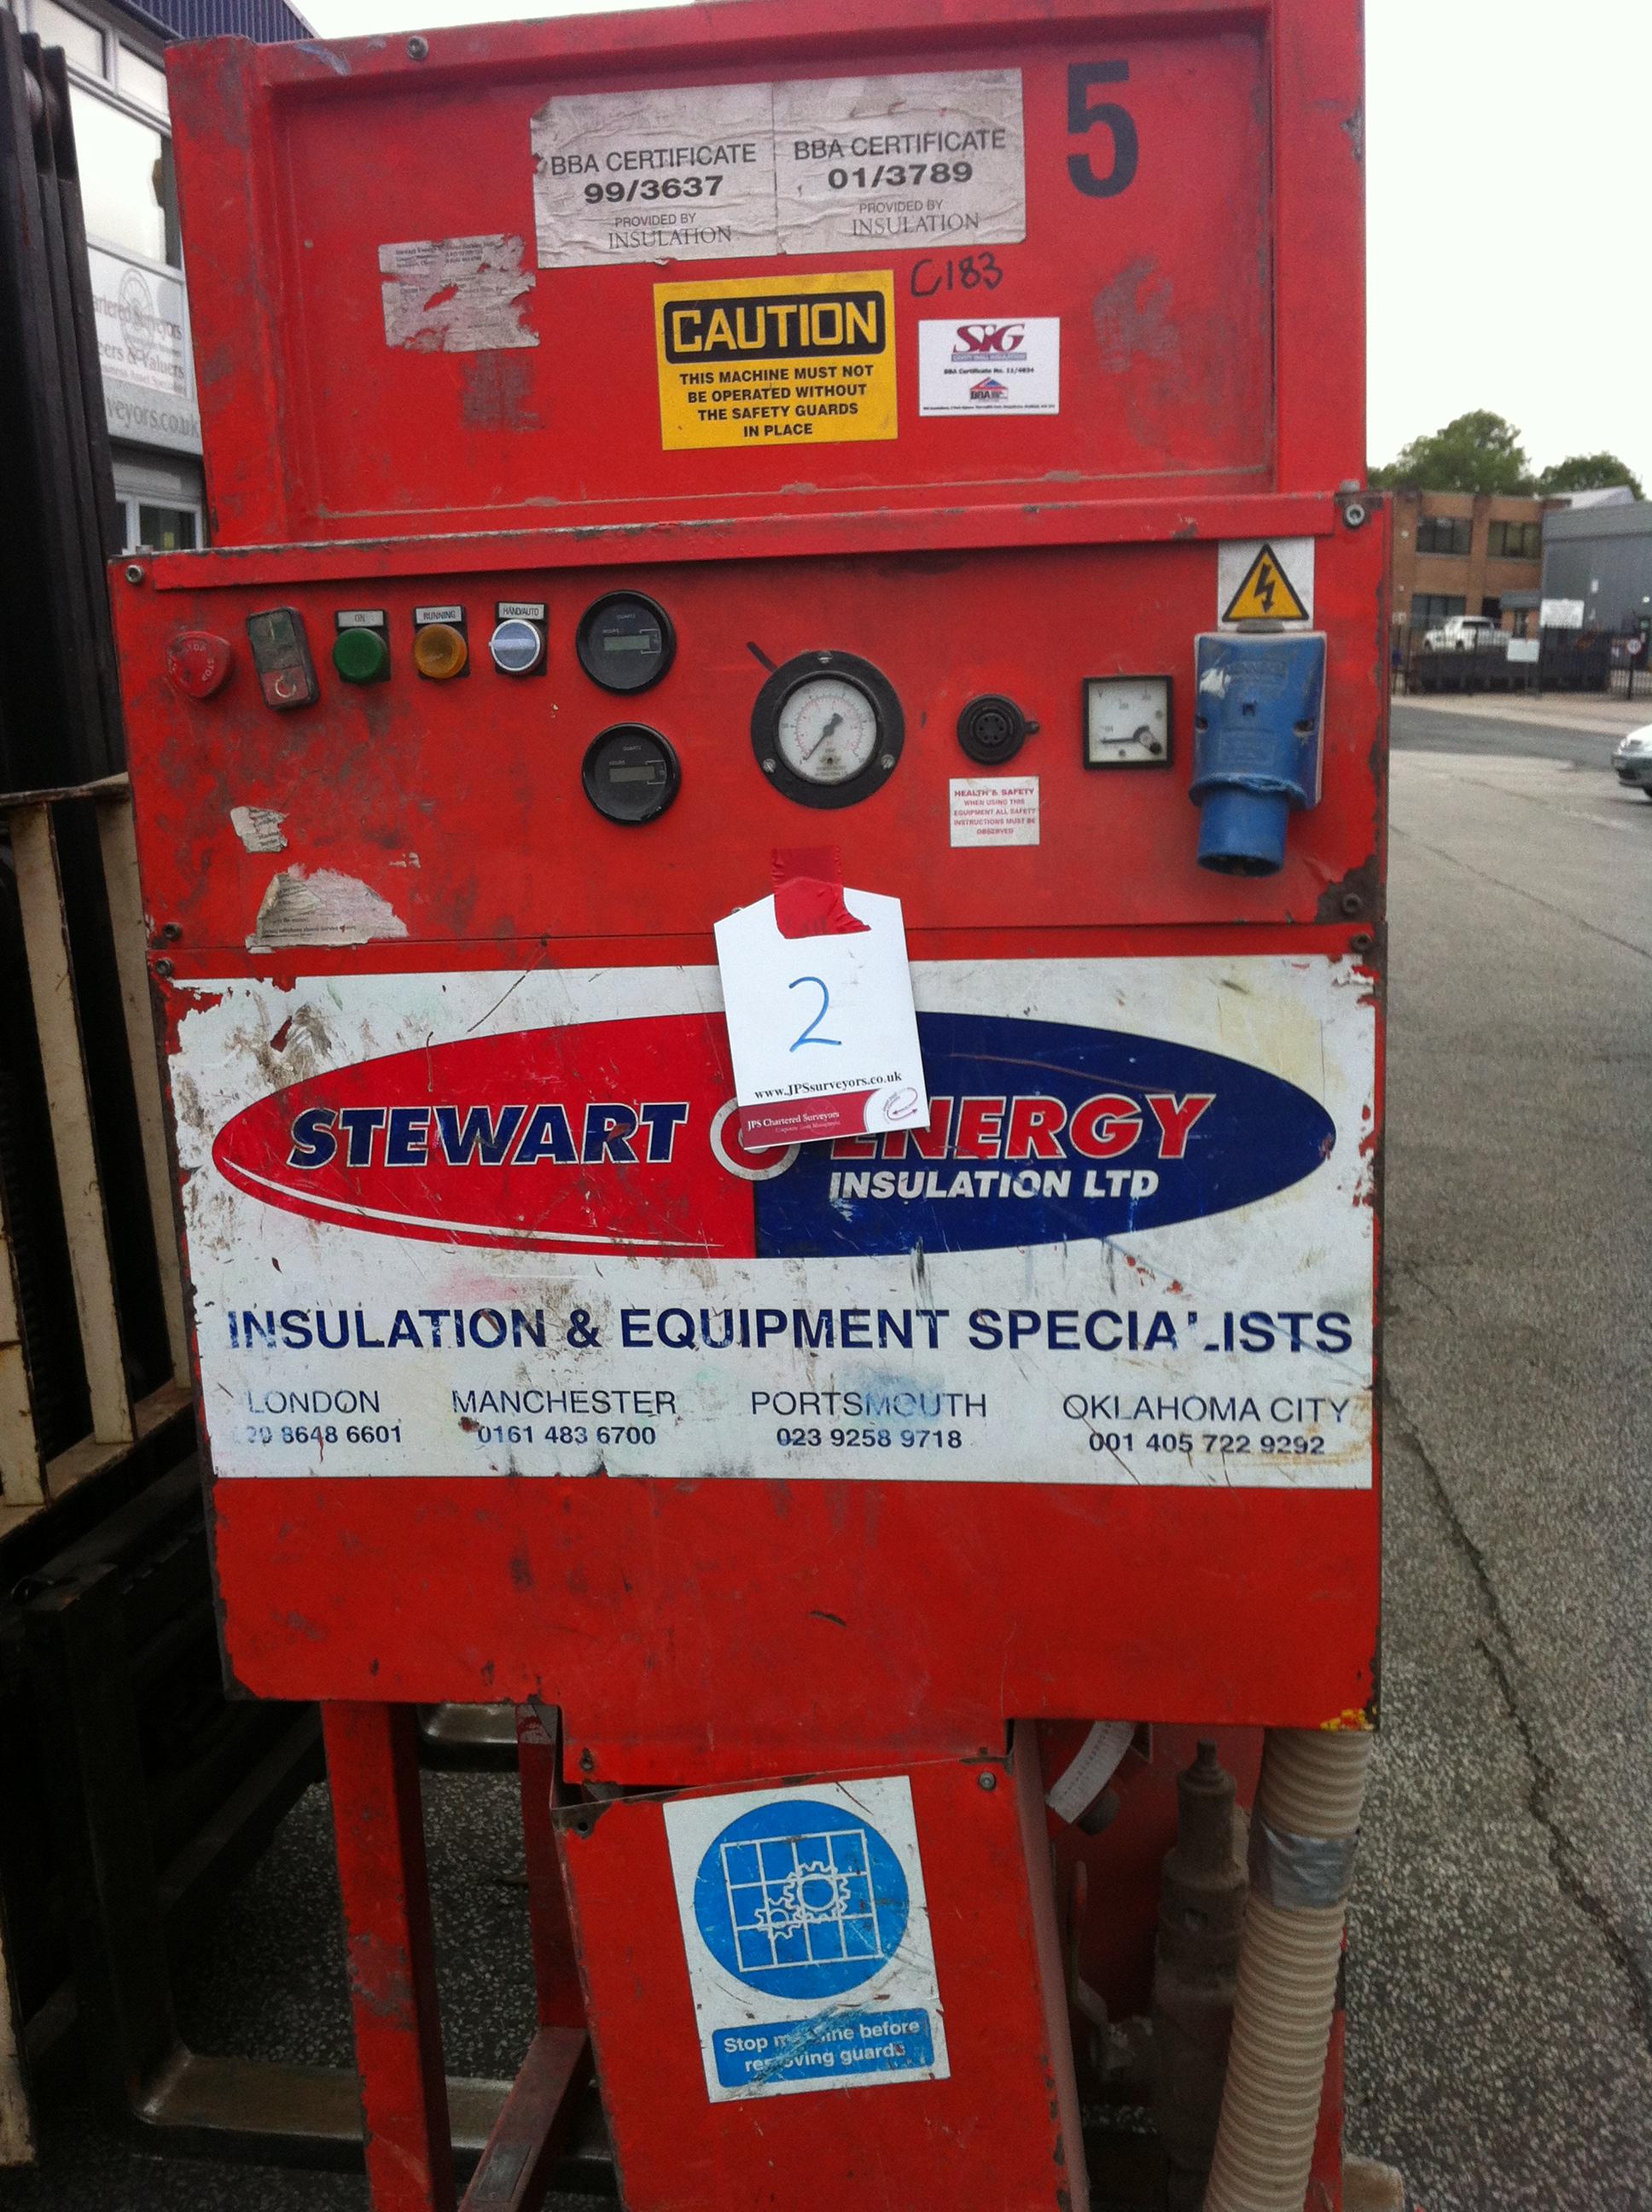 Stuart Energy Cavity Wall Insulation Machine